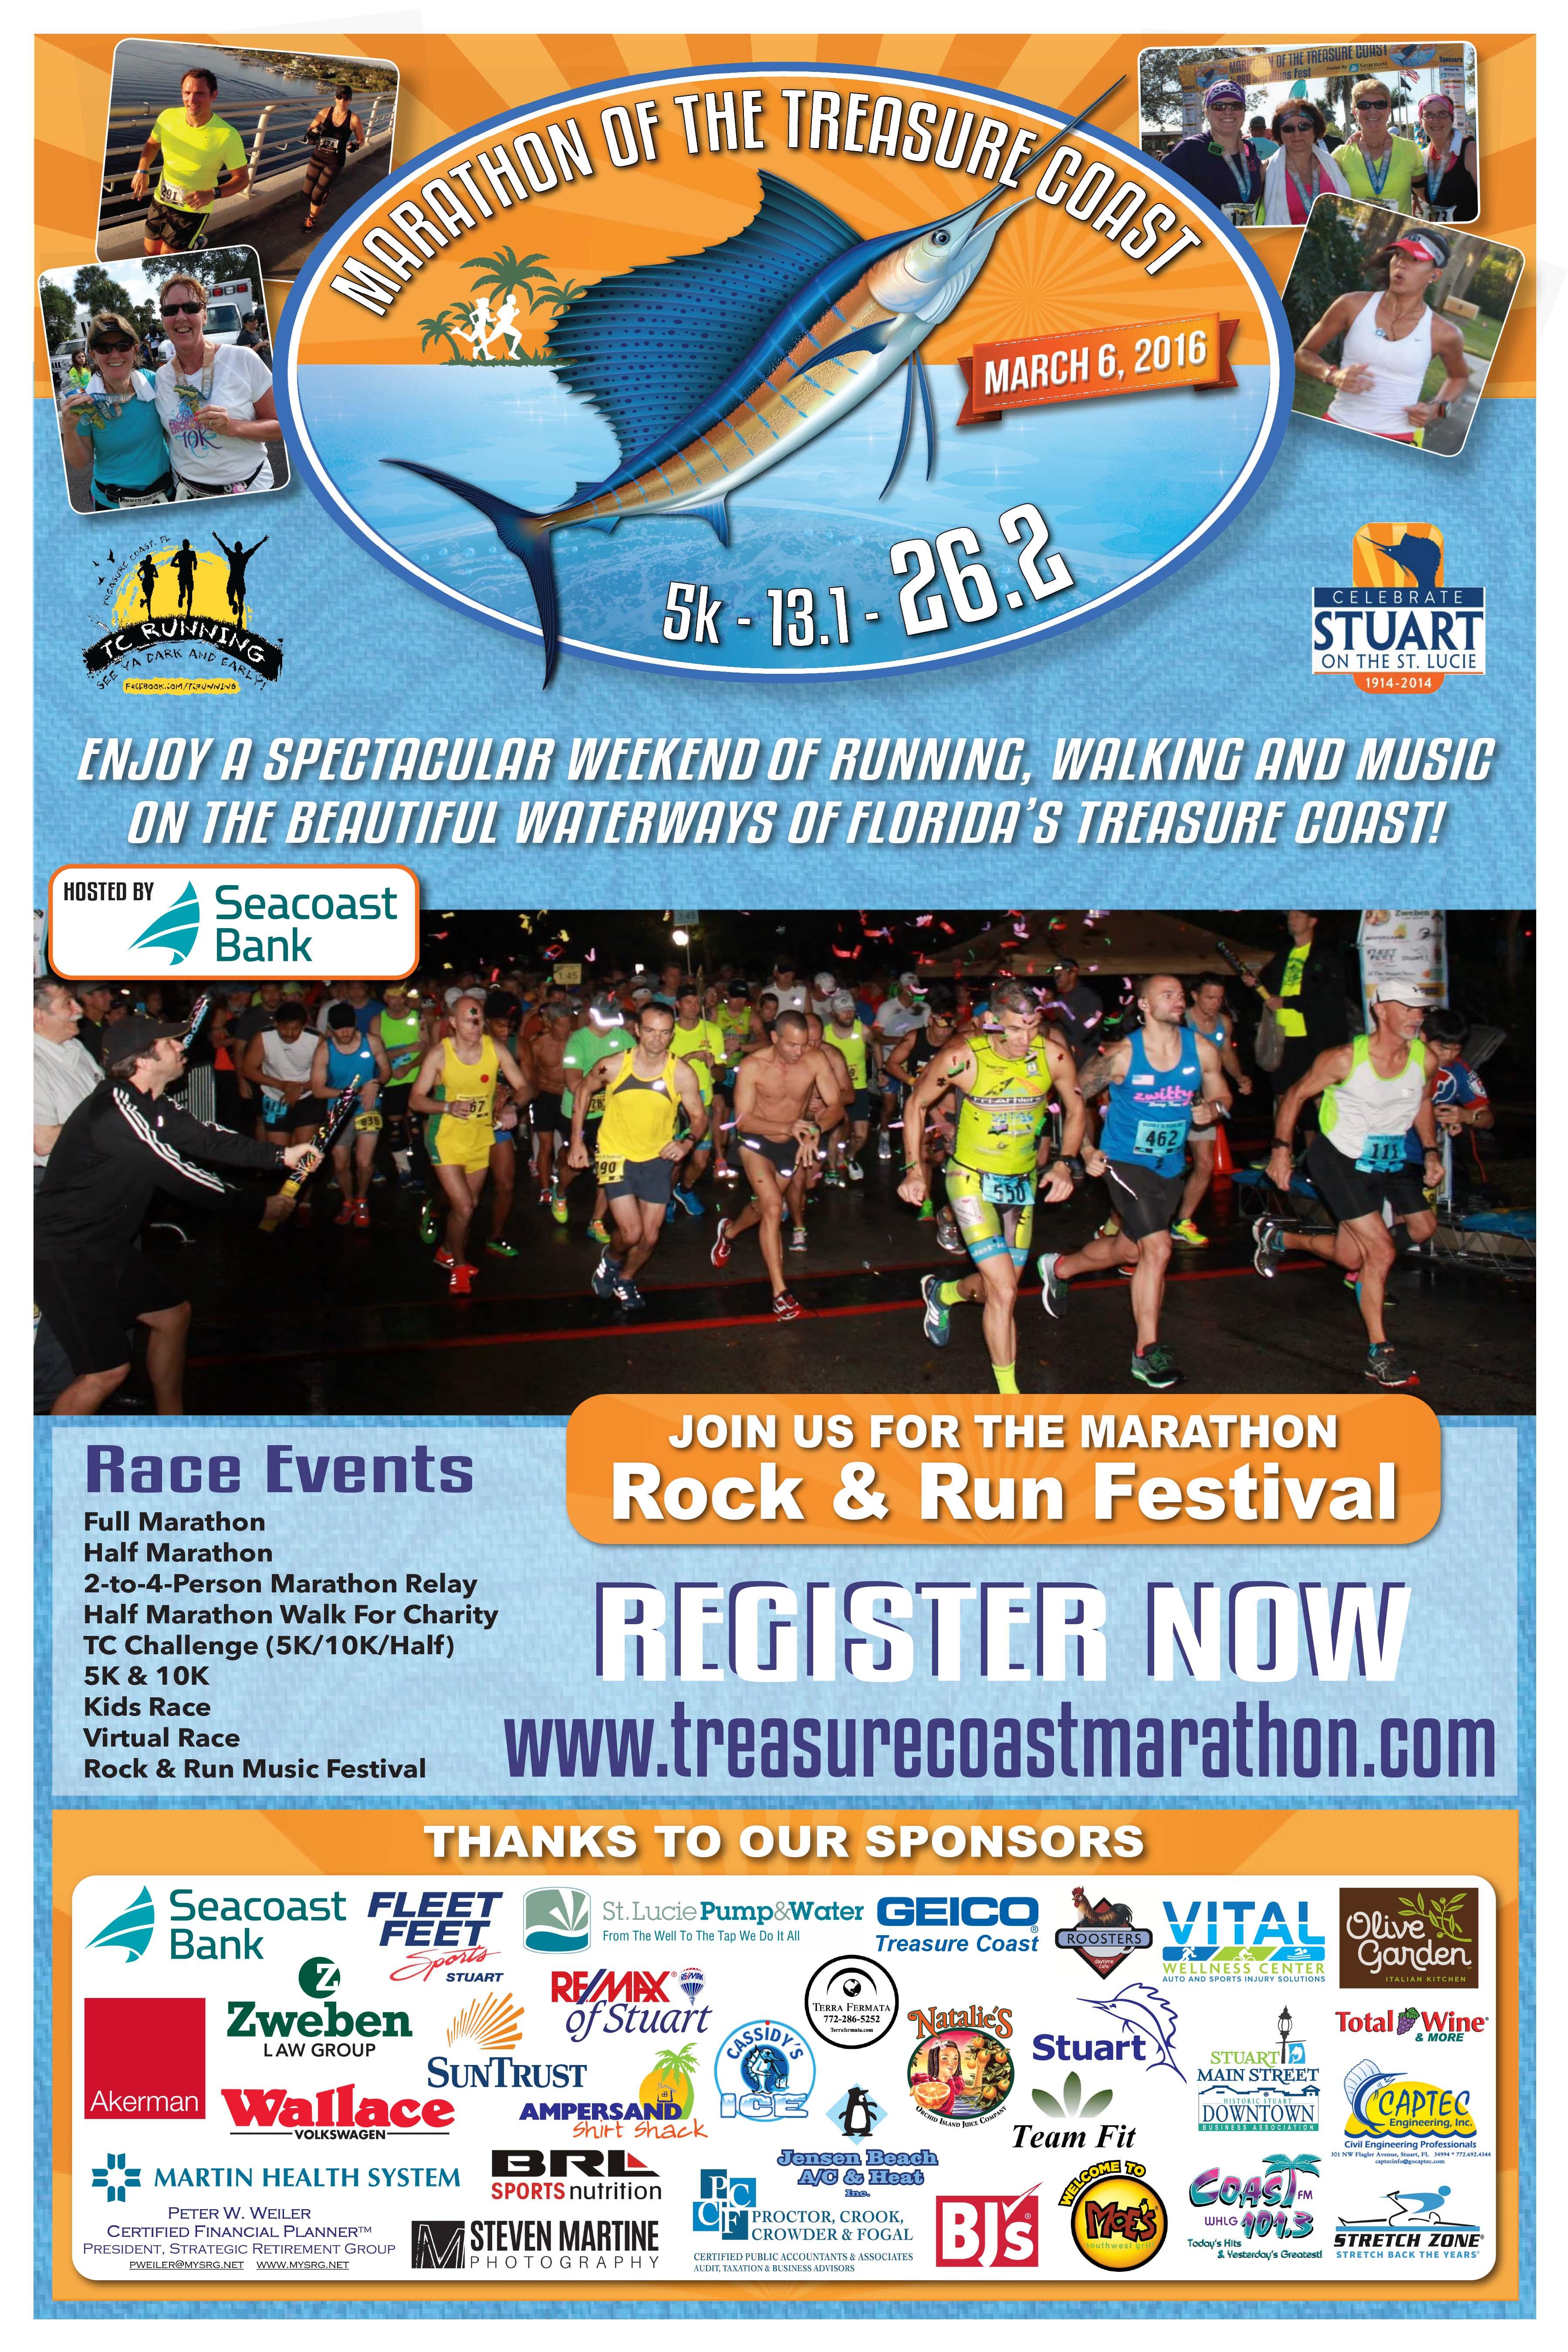 TC_Marathon_11x17_Poster_-_Pelican_2-5-2016.jpg